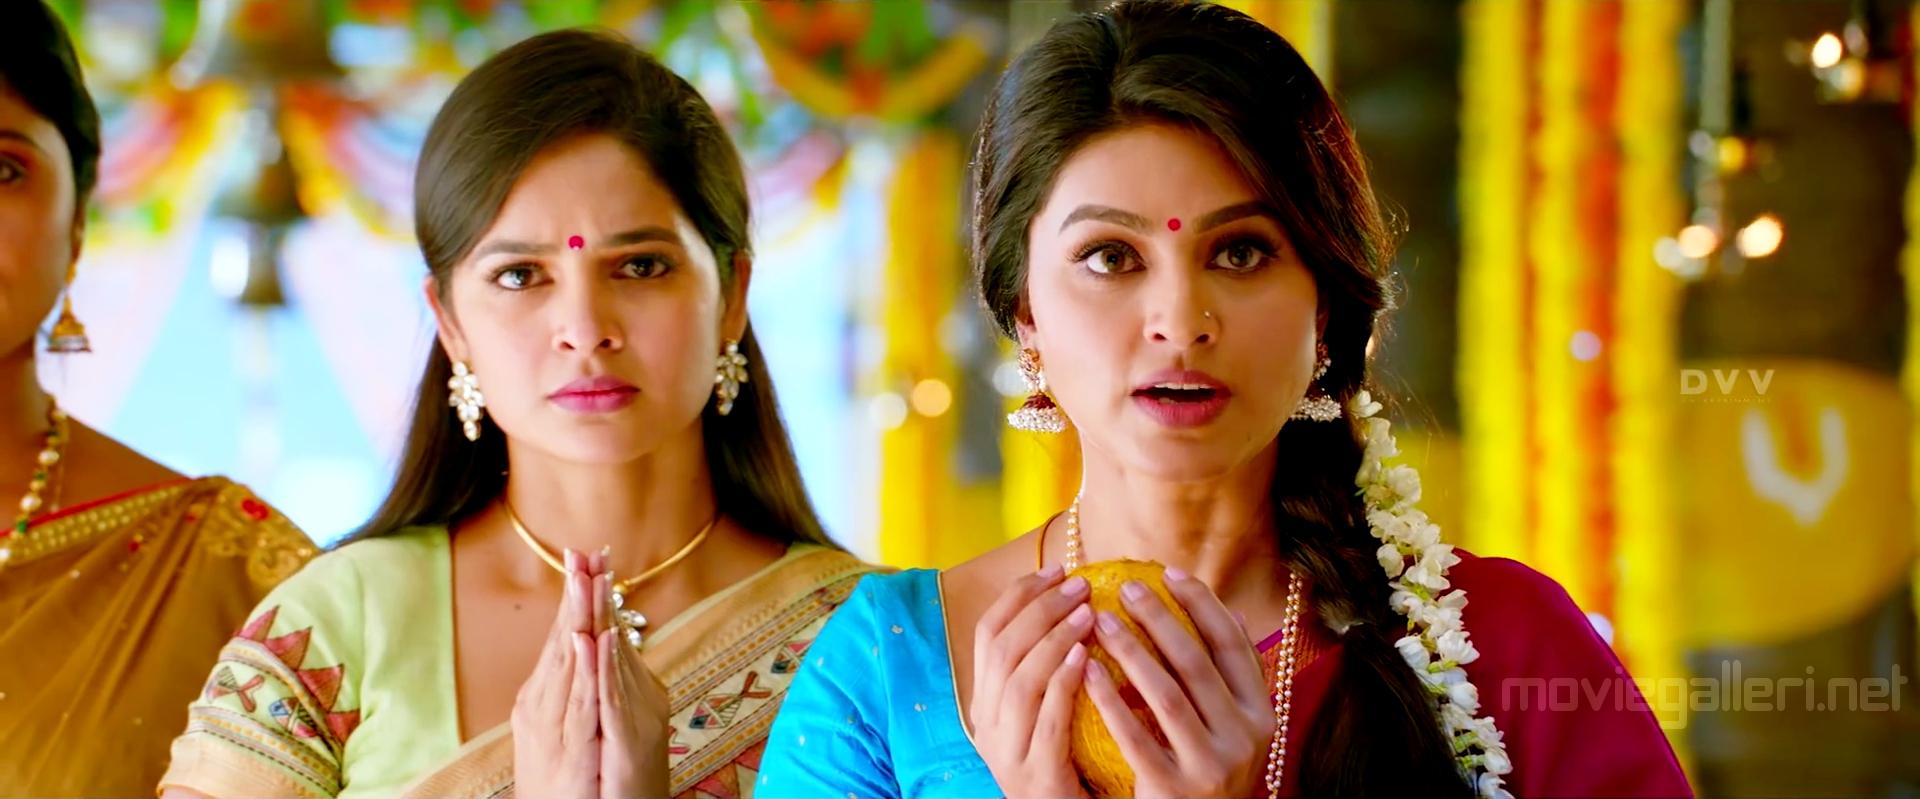 Actress Sneha in Vinaya Vidheya Rama Photos